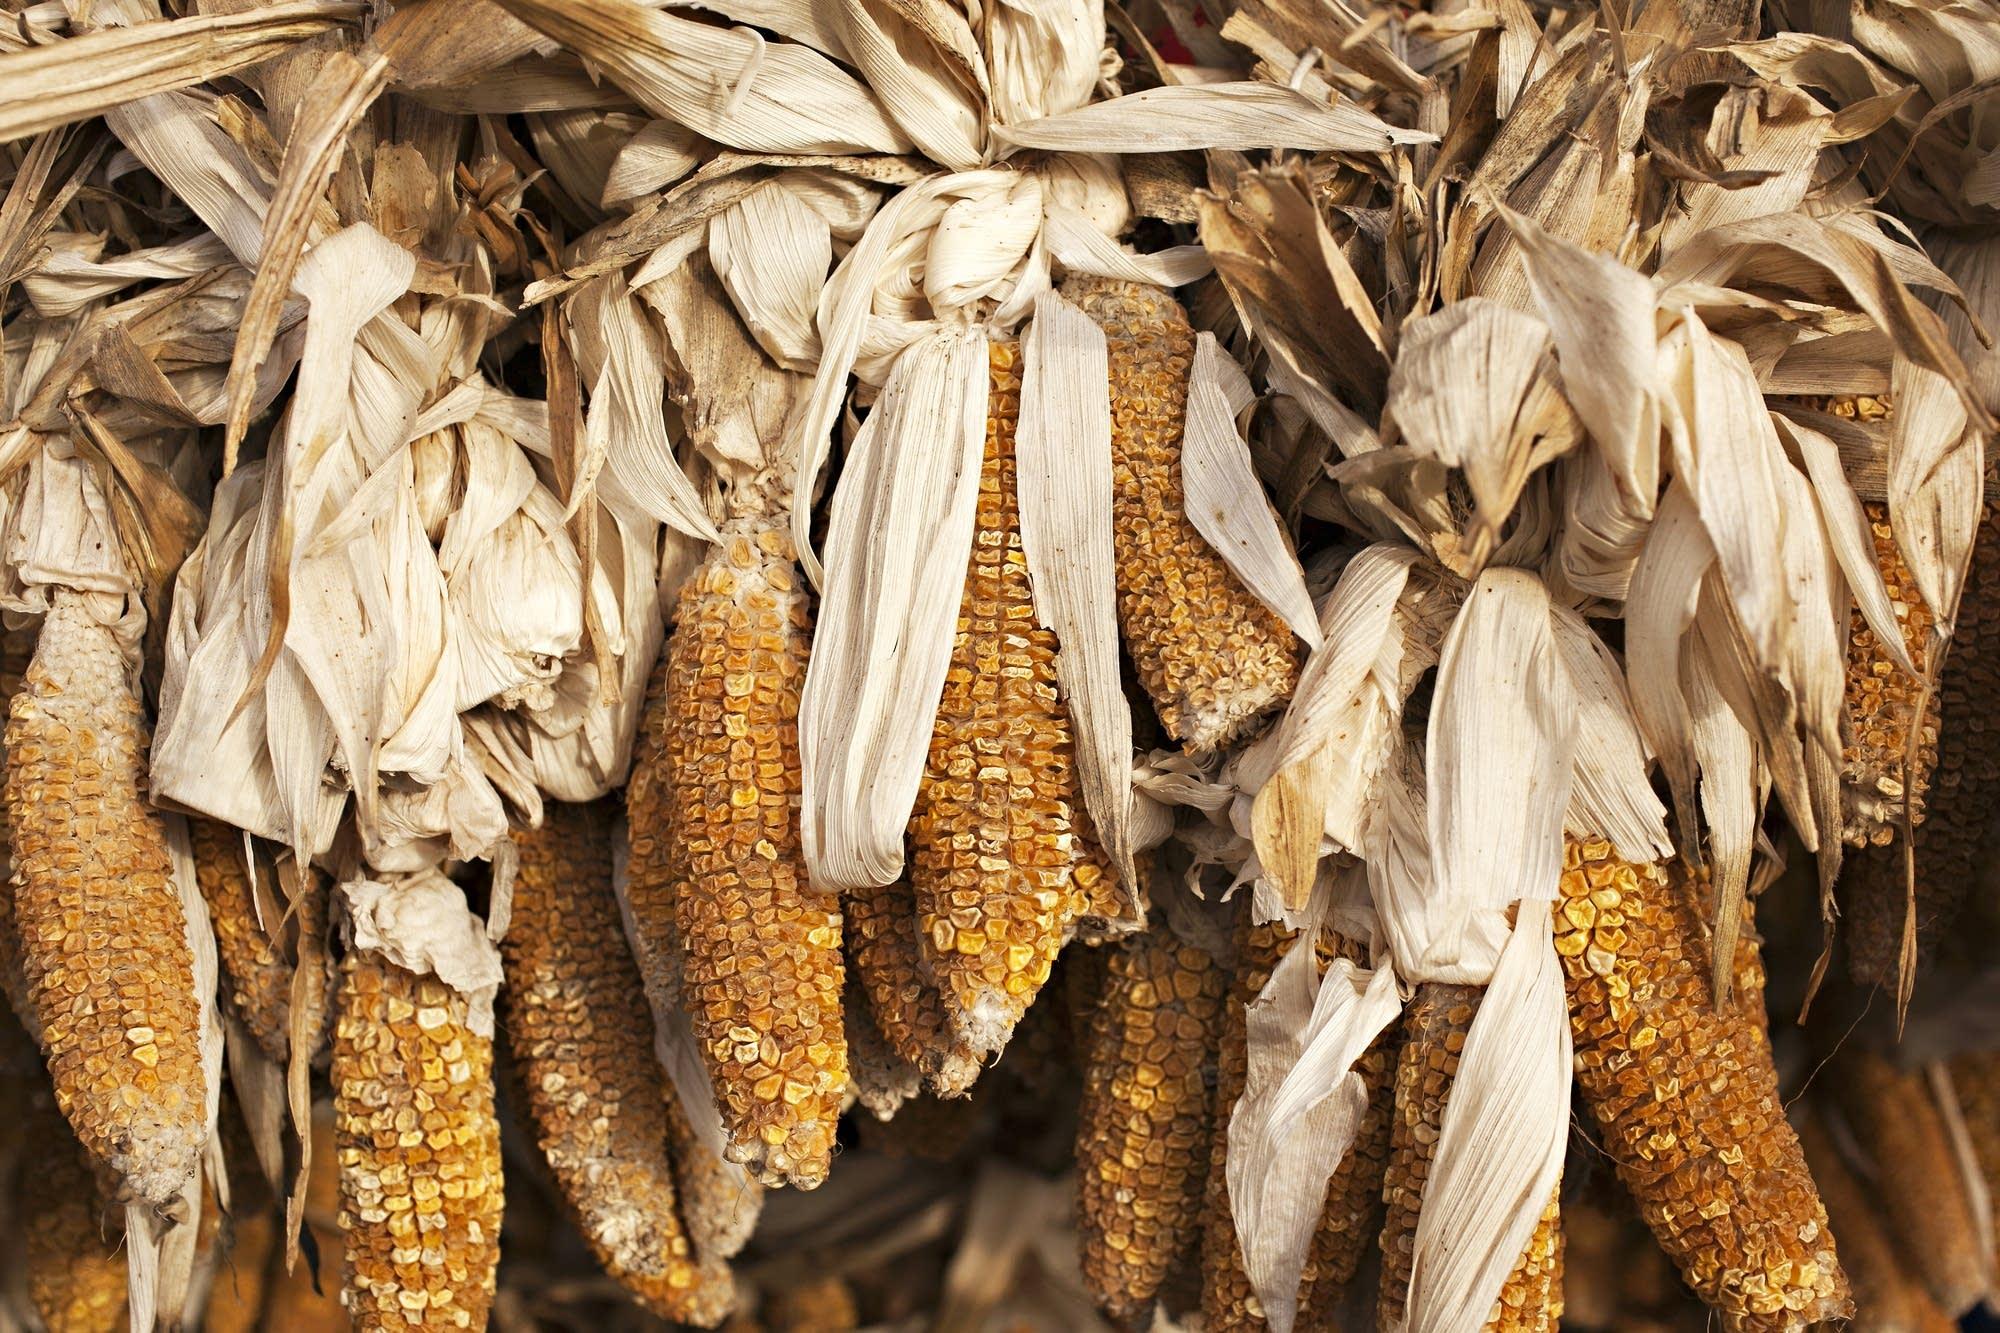 Morning sun illuminates dried corn.